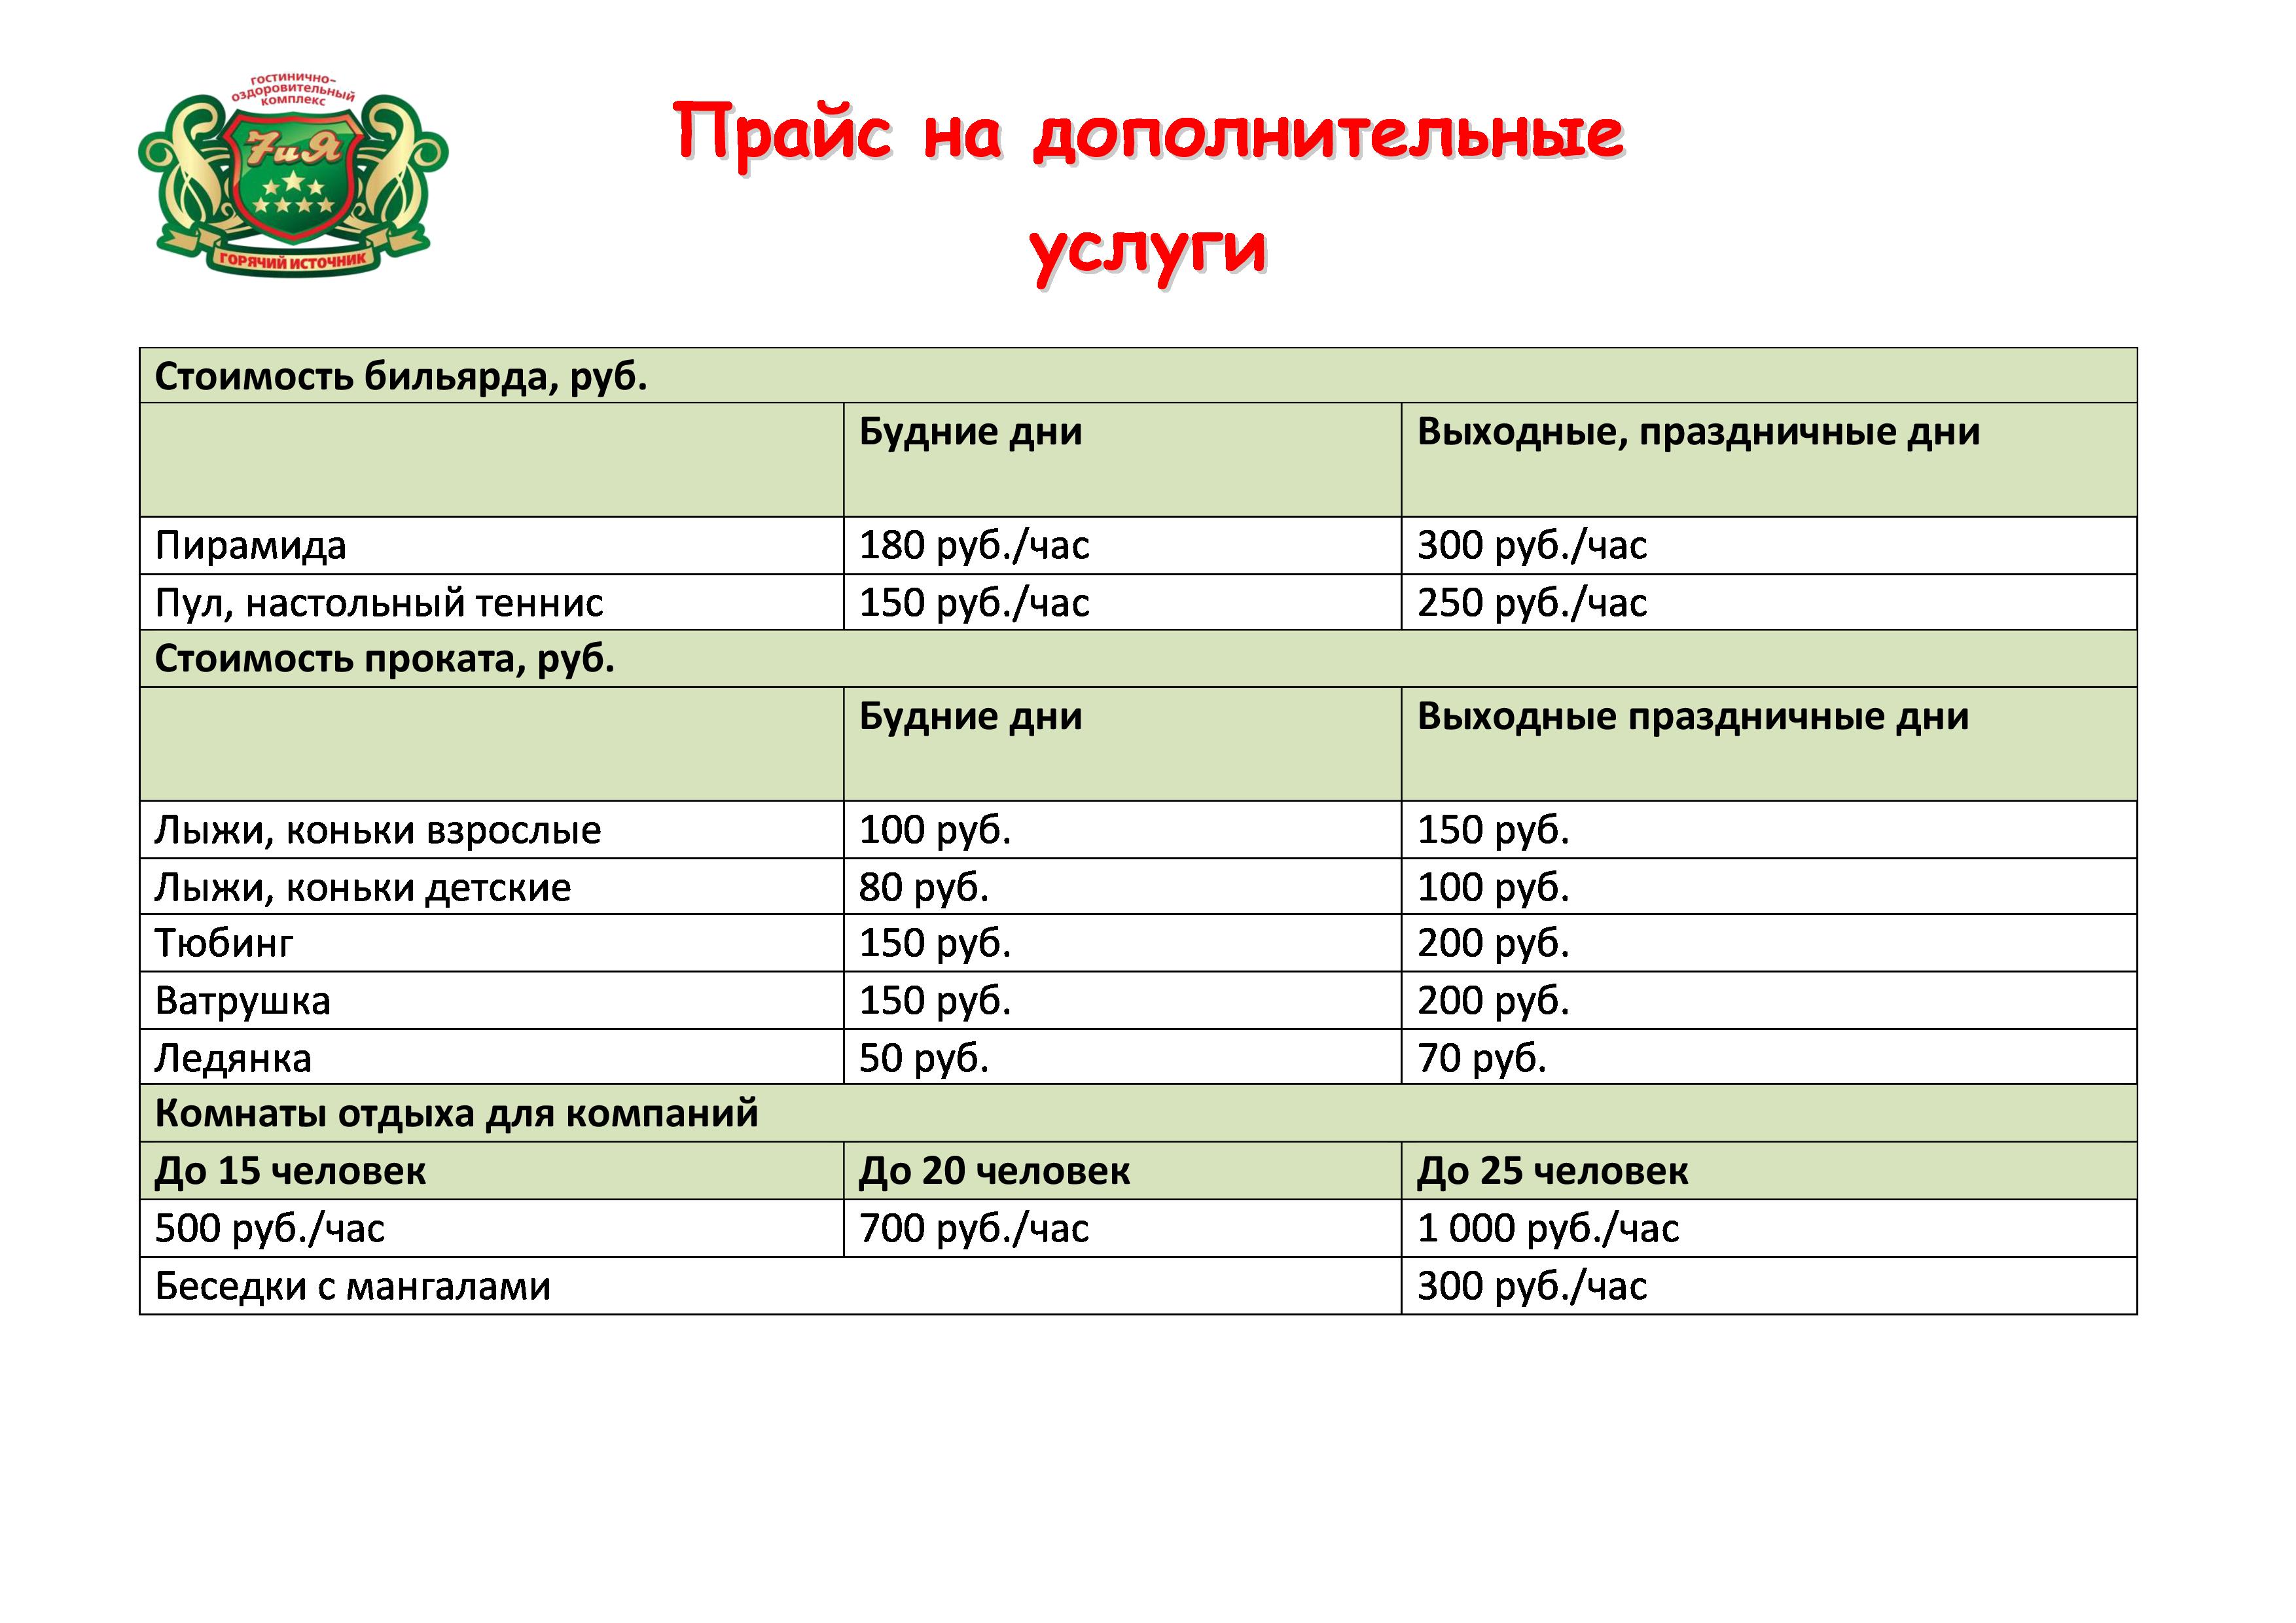 ПРАЙС-РОДНИК2-1